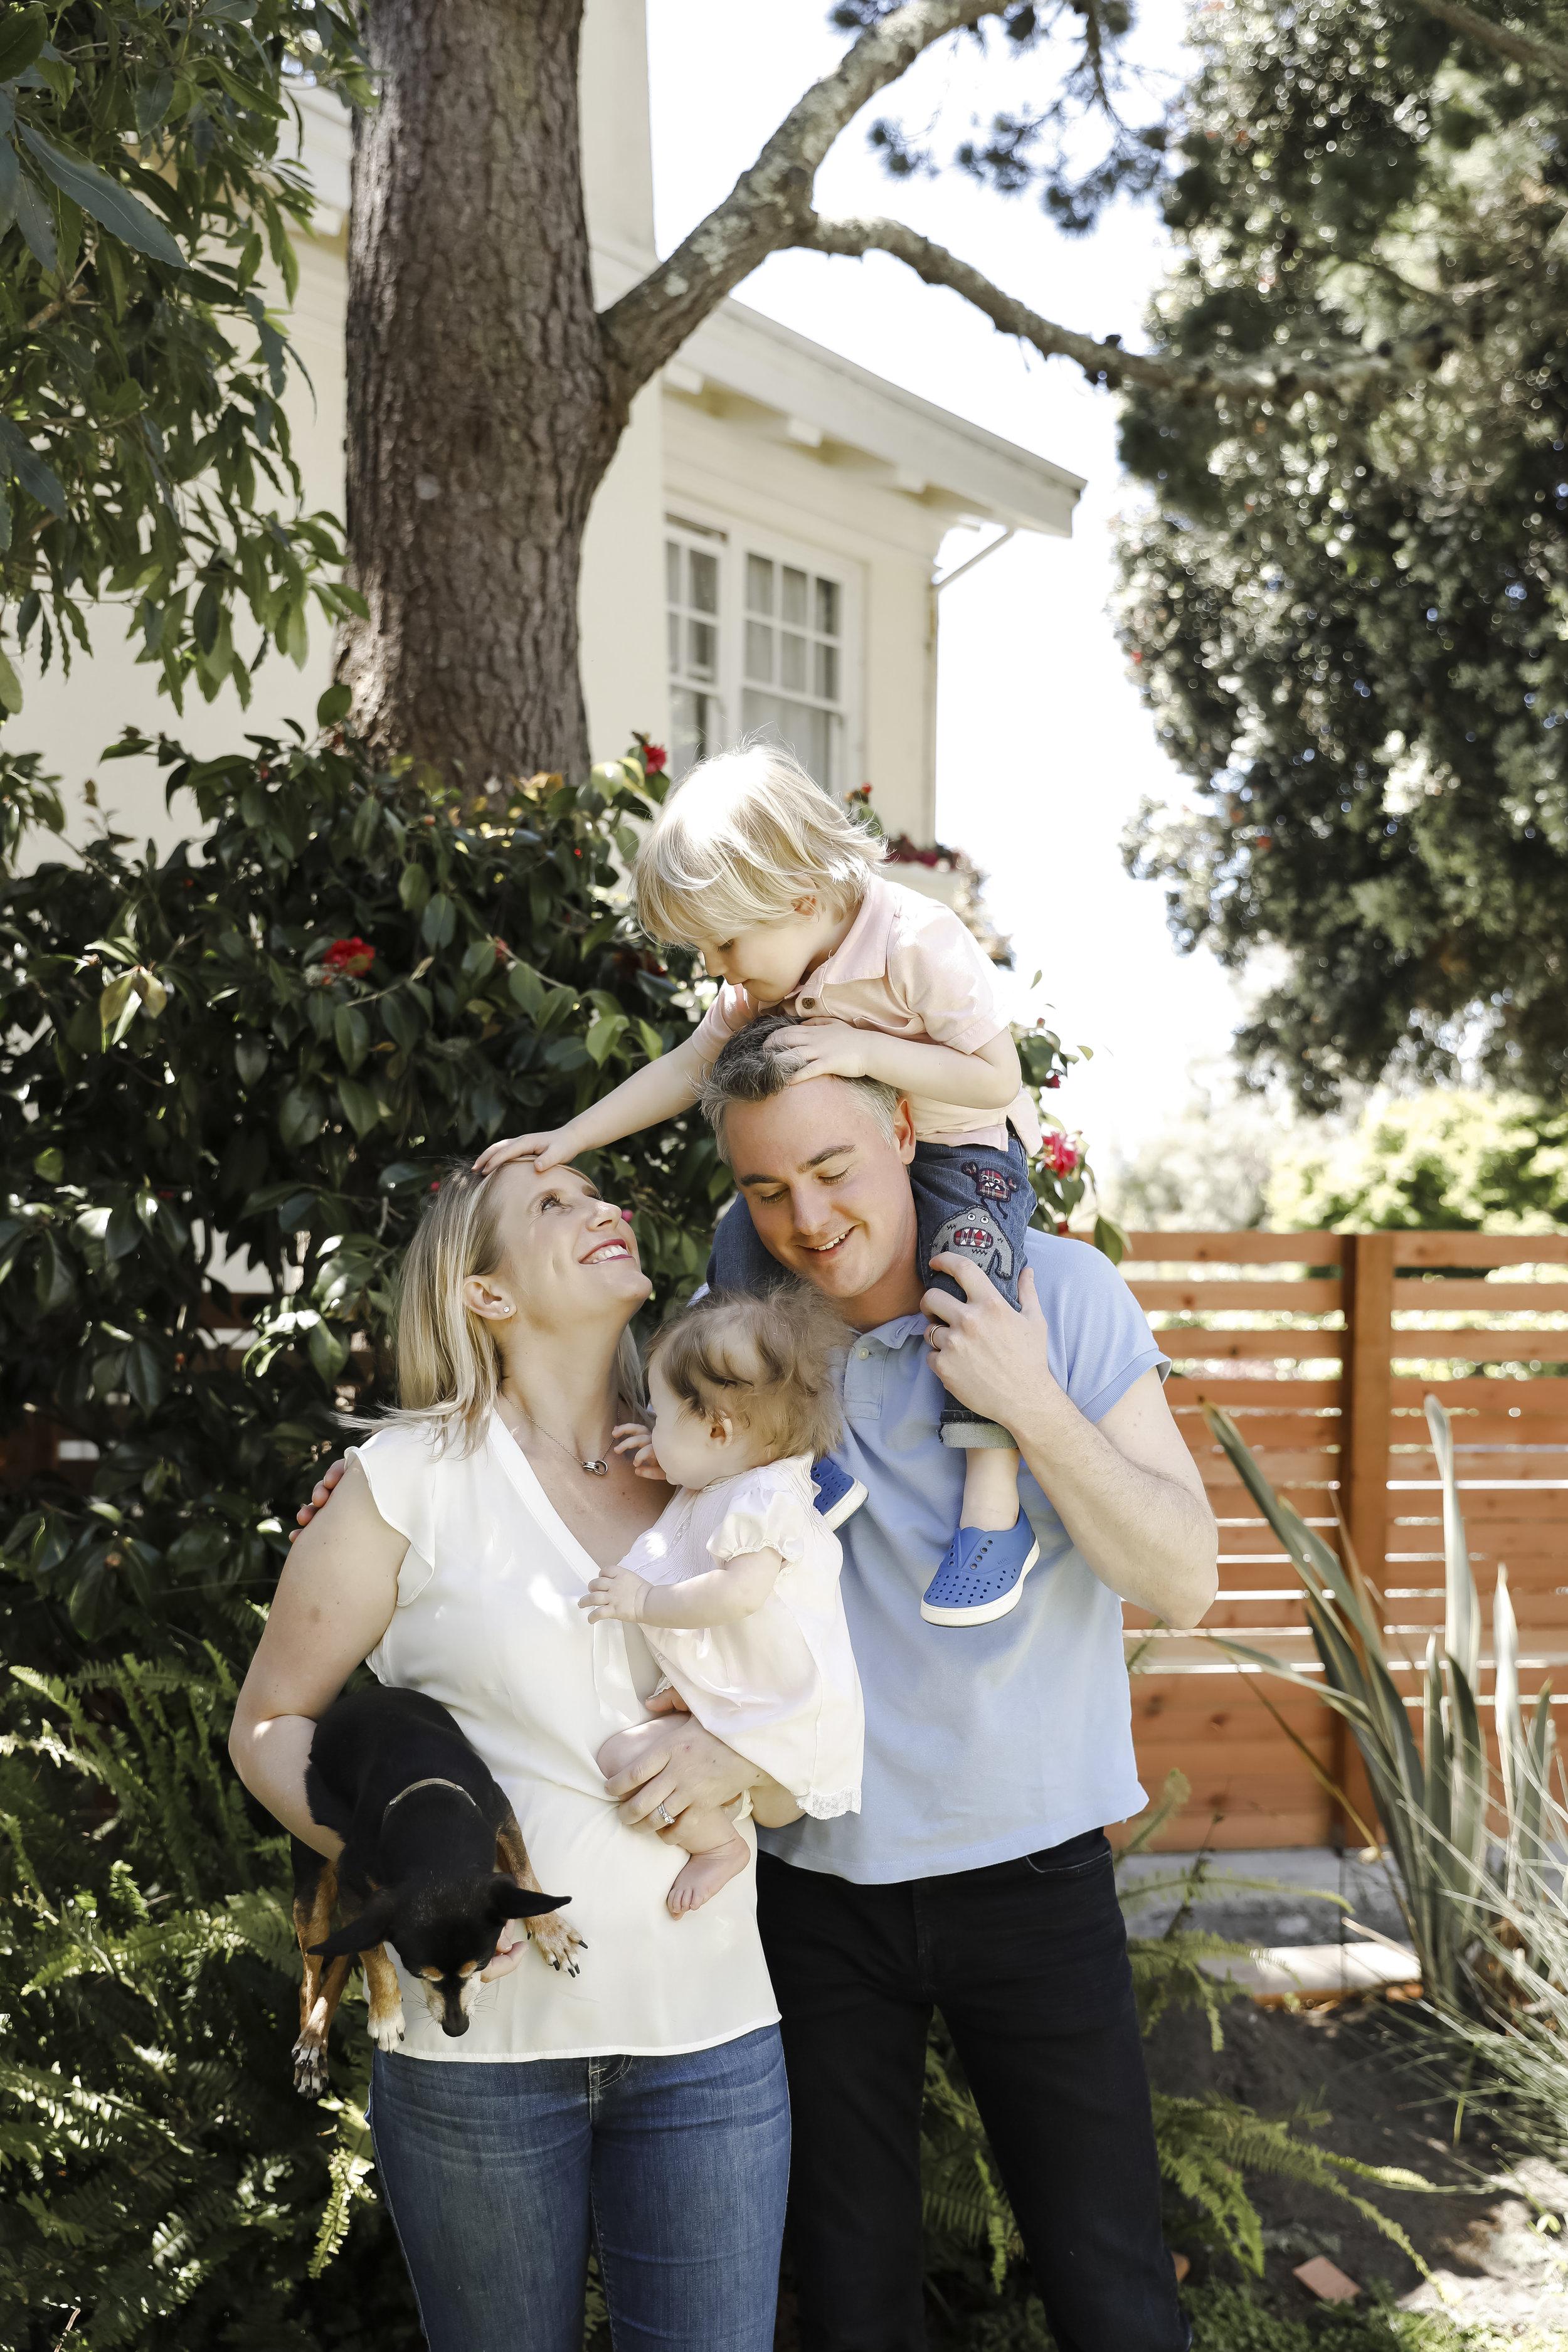 sainefamily-ahp-00103.jpg